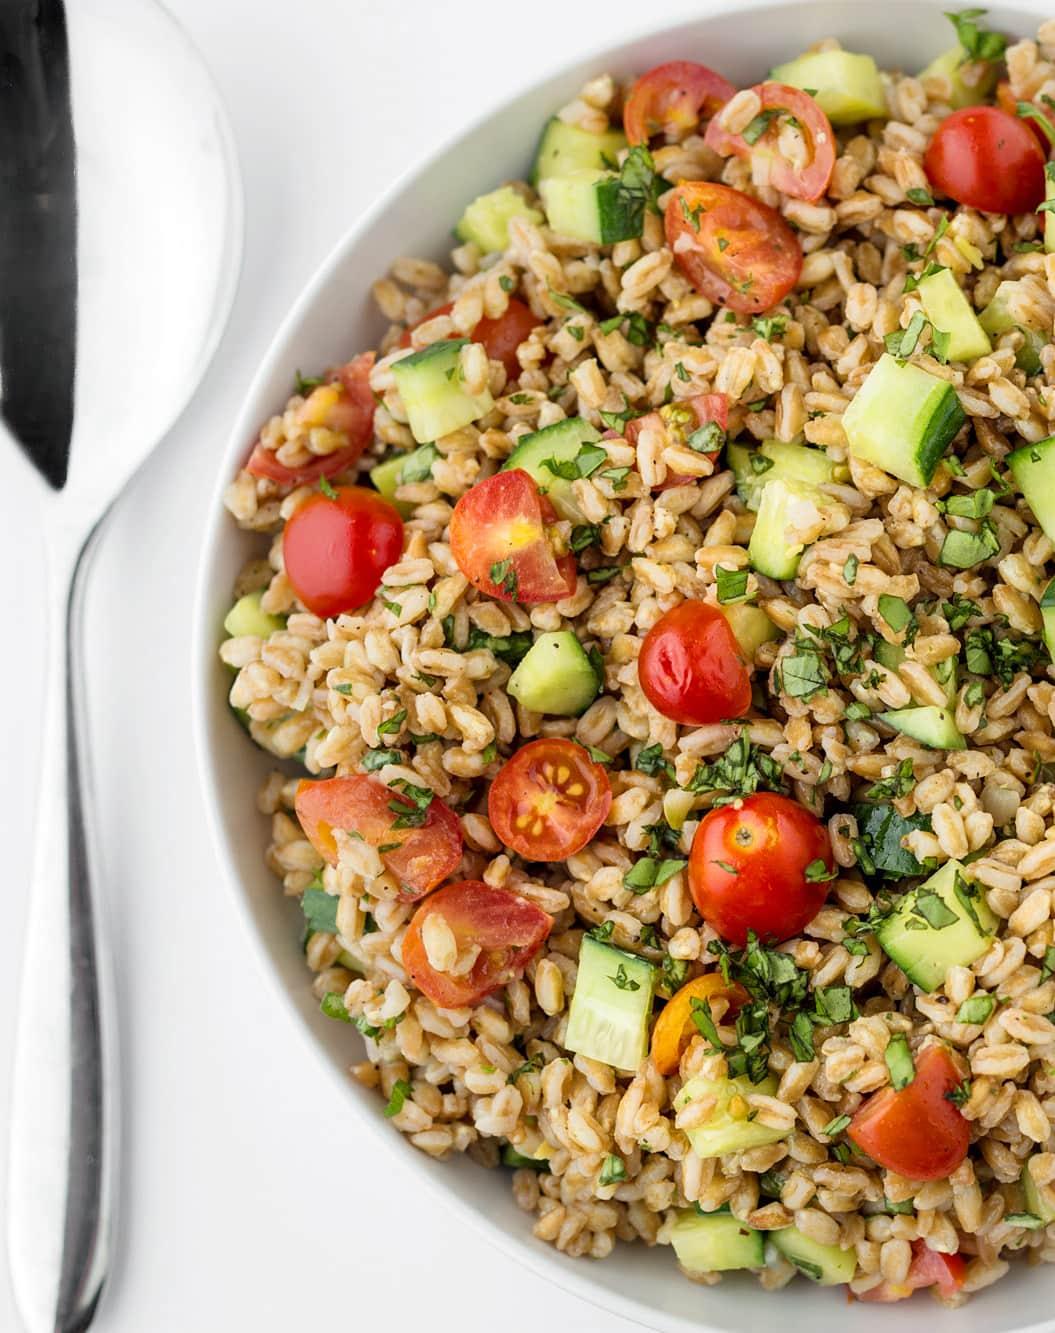 Recipe: Summer Farro Salad with Tomatoes, Cucumbers & Basil